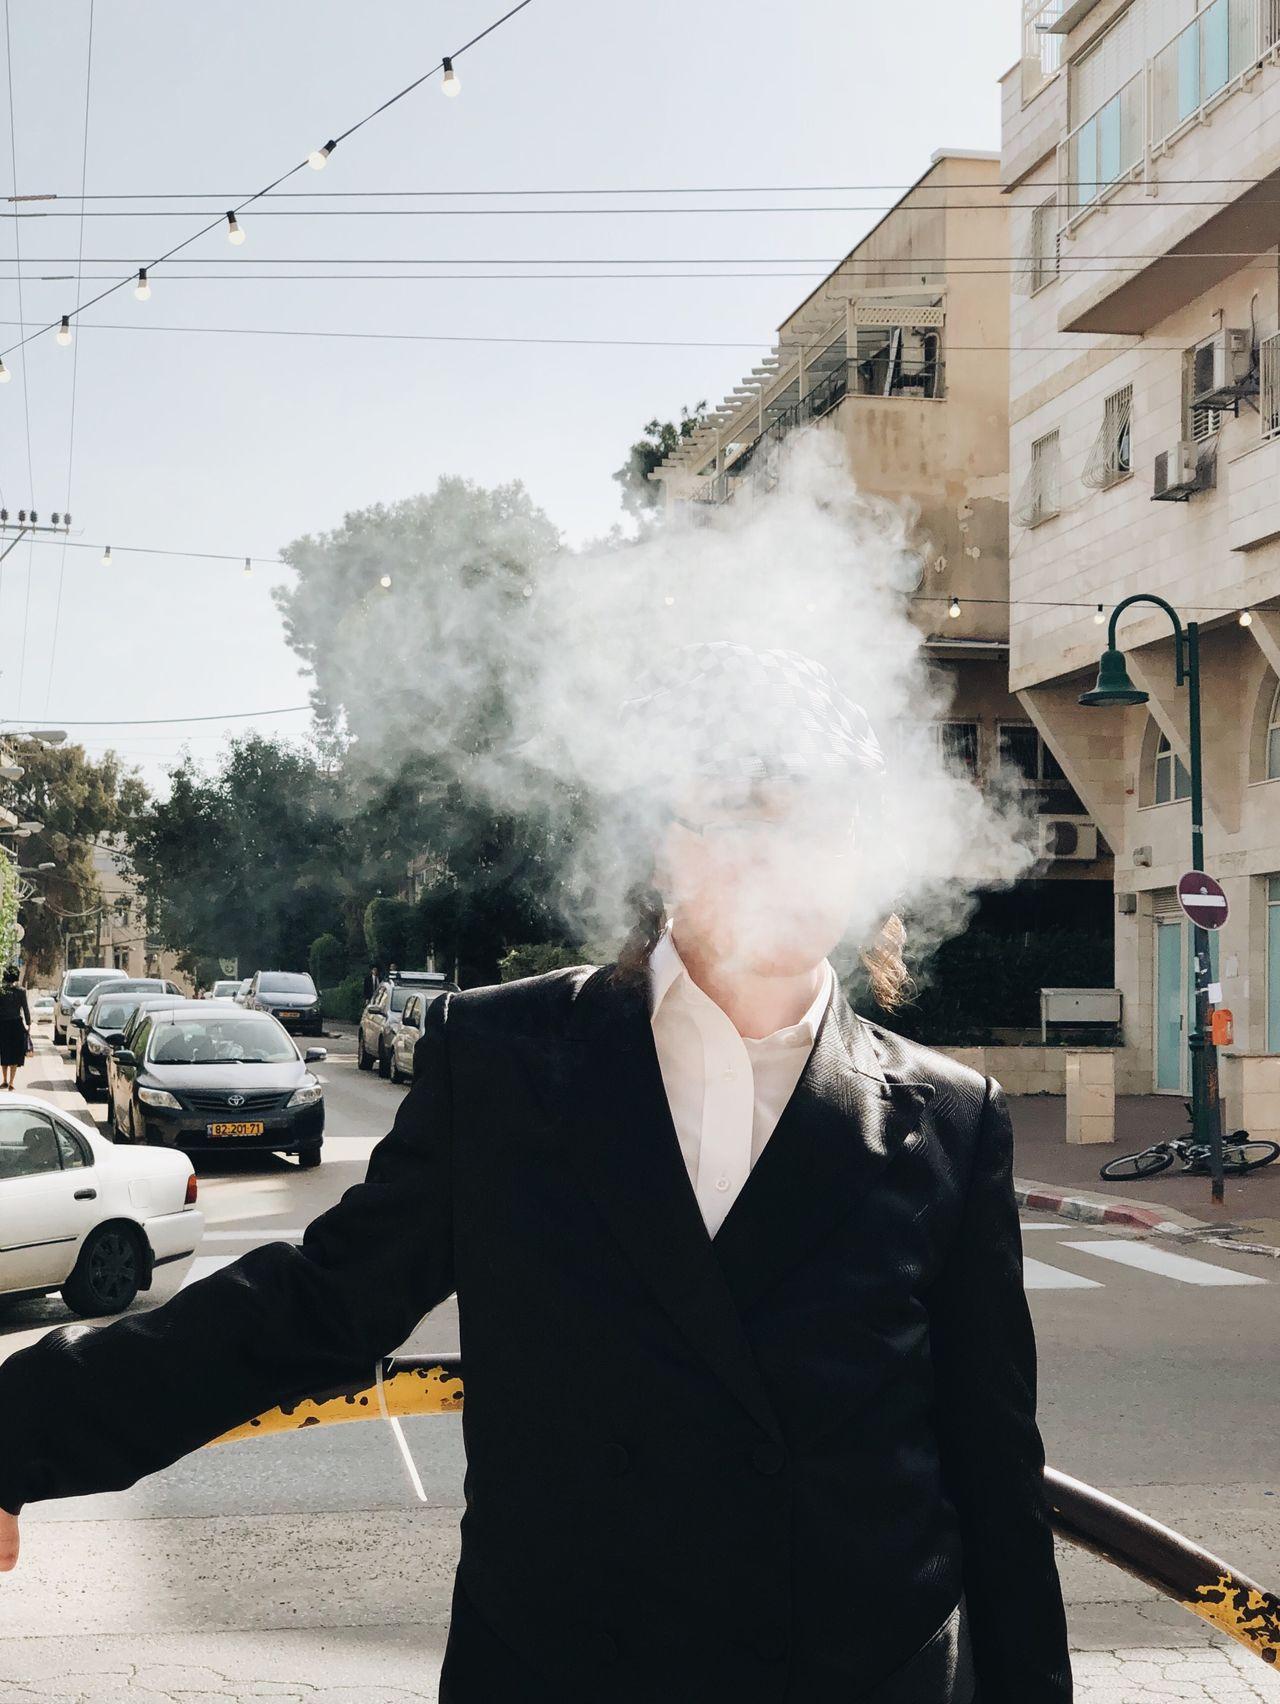 Close-up of man smoking on city street